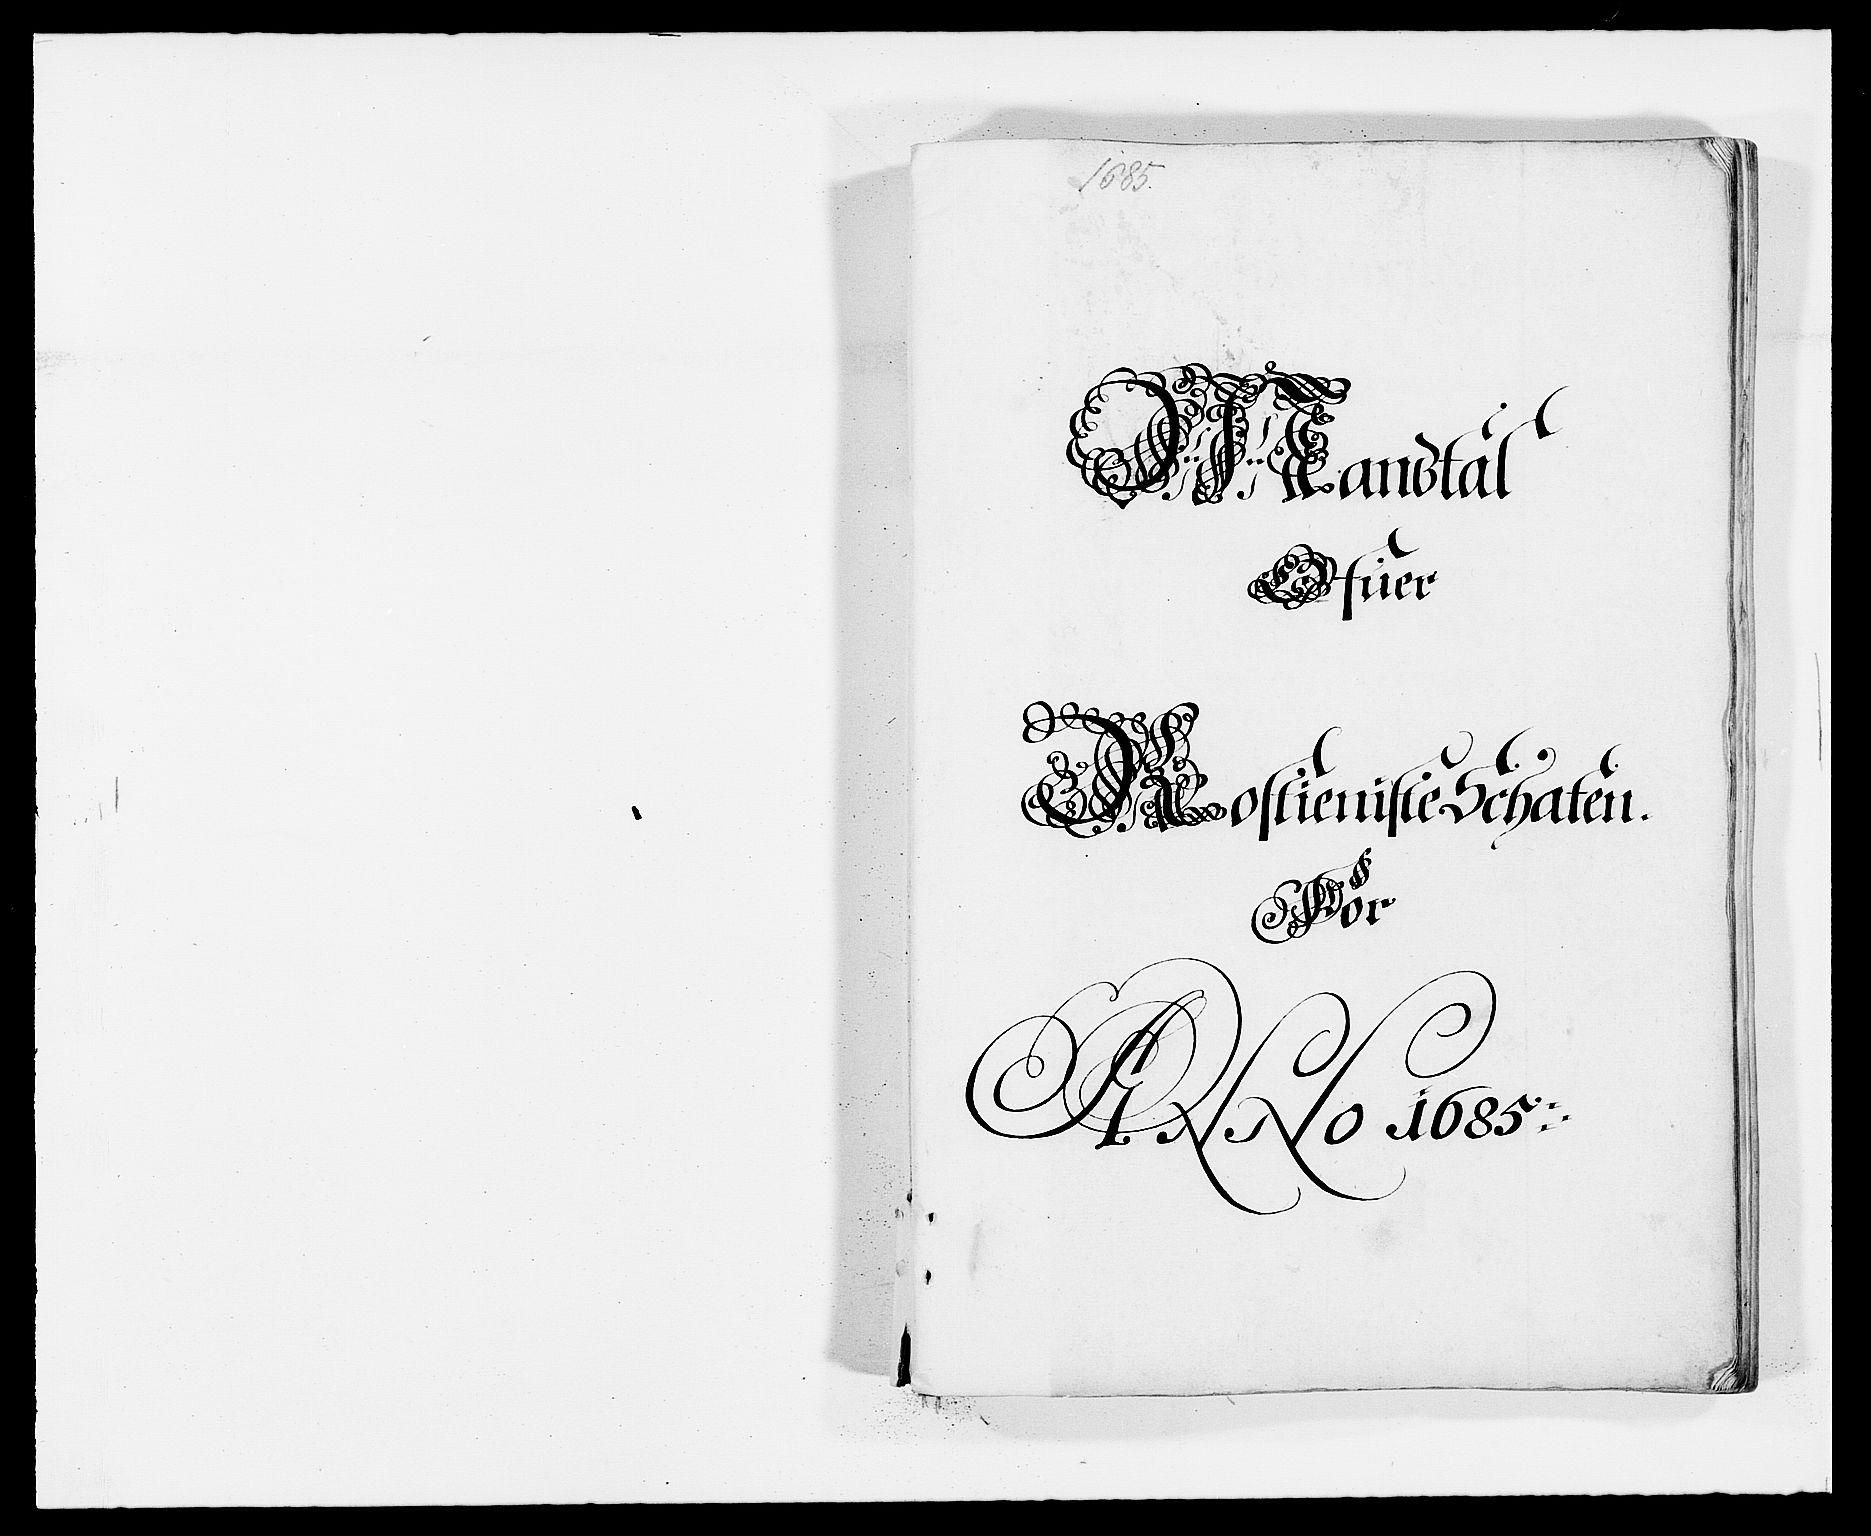 RA, Rentekammeret inntil 1814, Reviderte regnskaper, Fogderegnskap, R32/L1856: Fogderegnskap Jarlsberg grevskap, 1685, s. 231